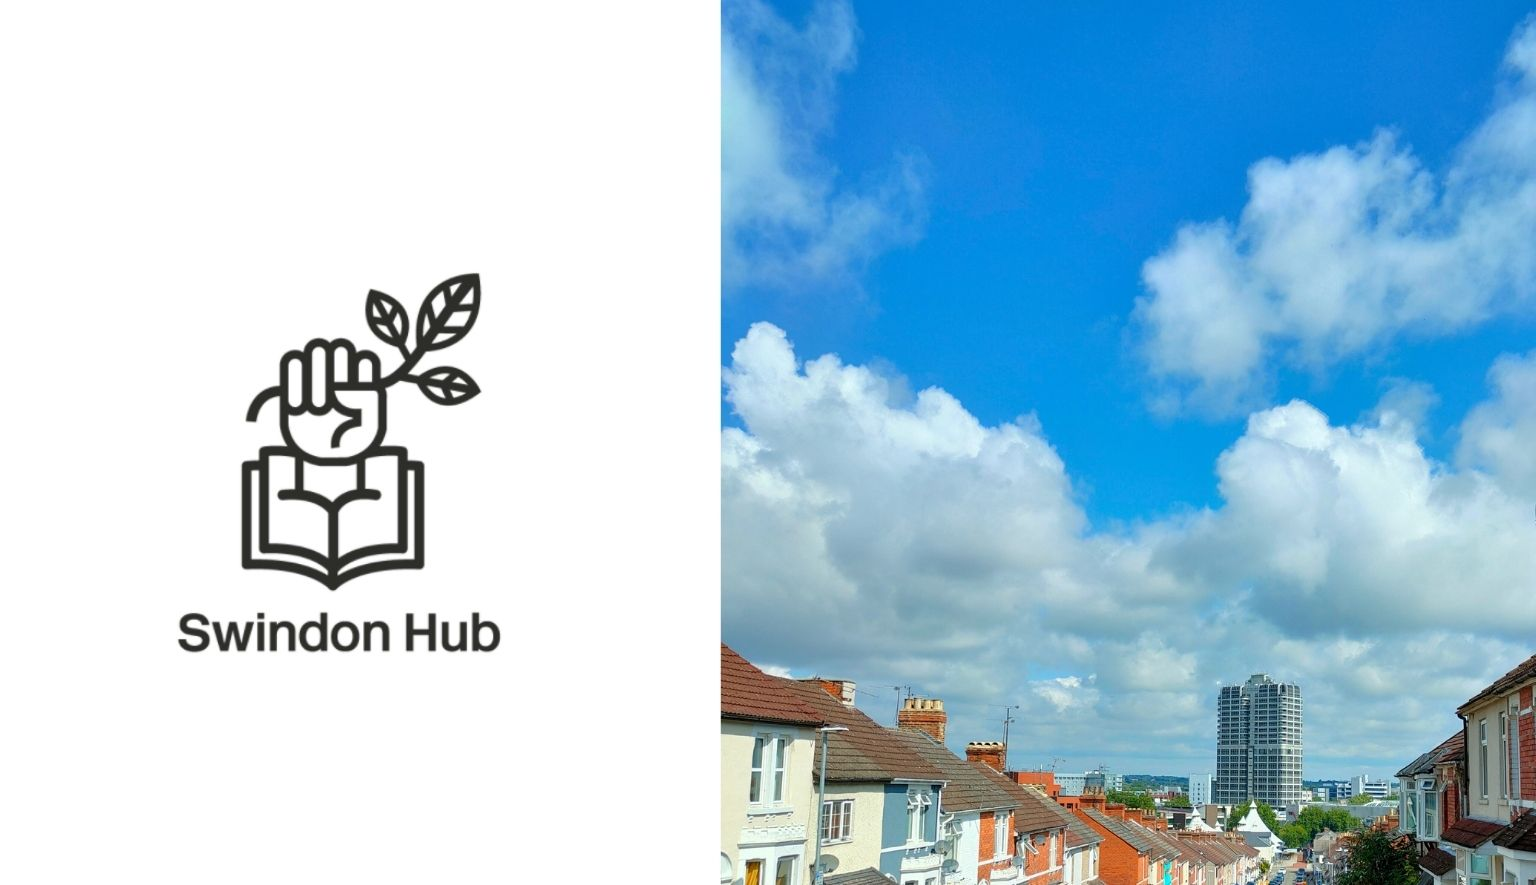 Swindon Hub